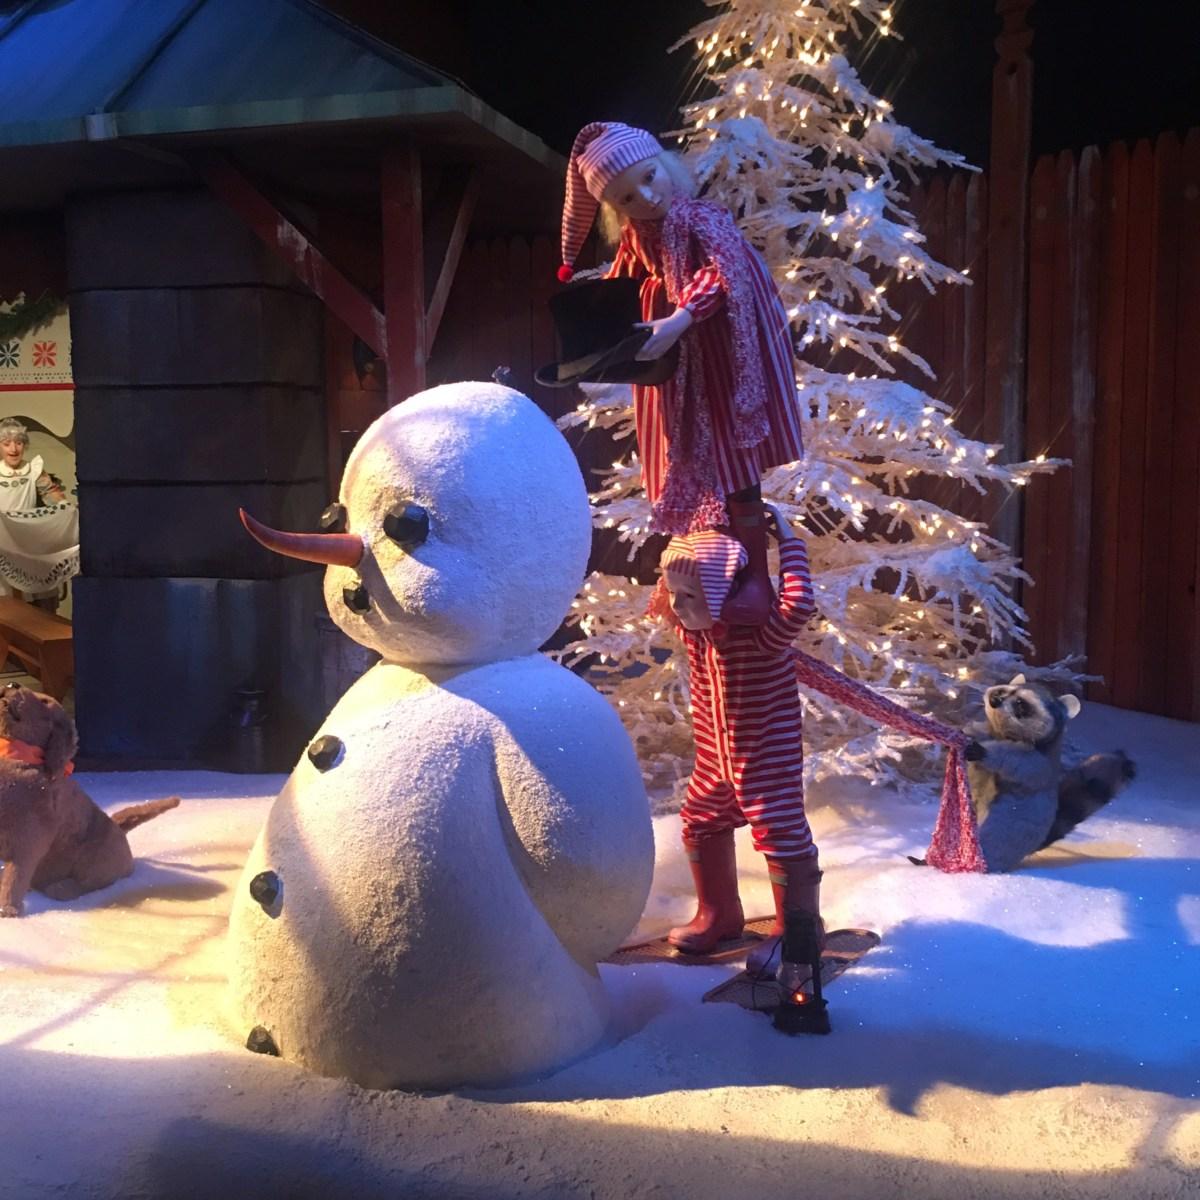 Santaland Kids Building a Snowman